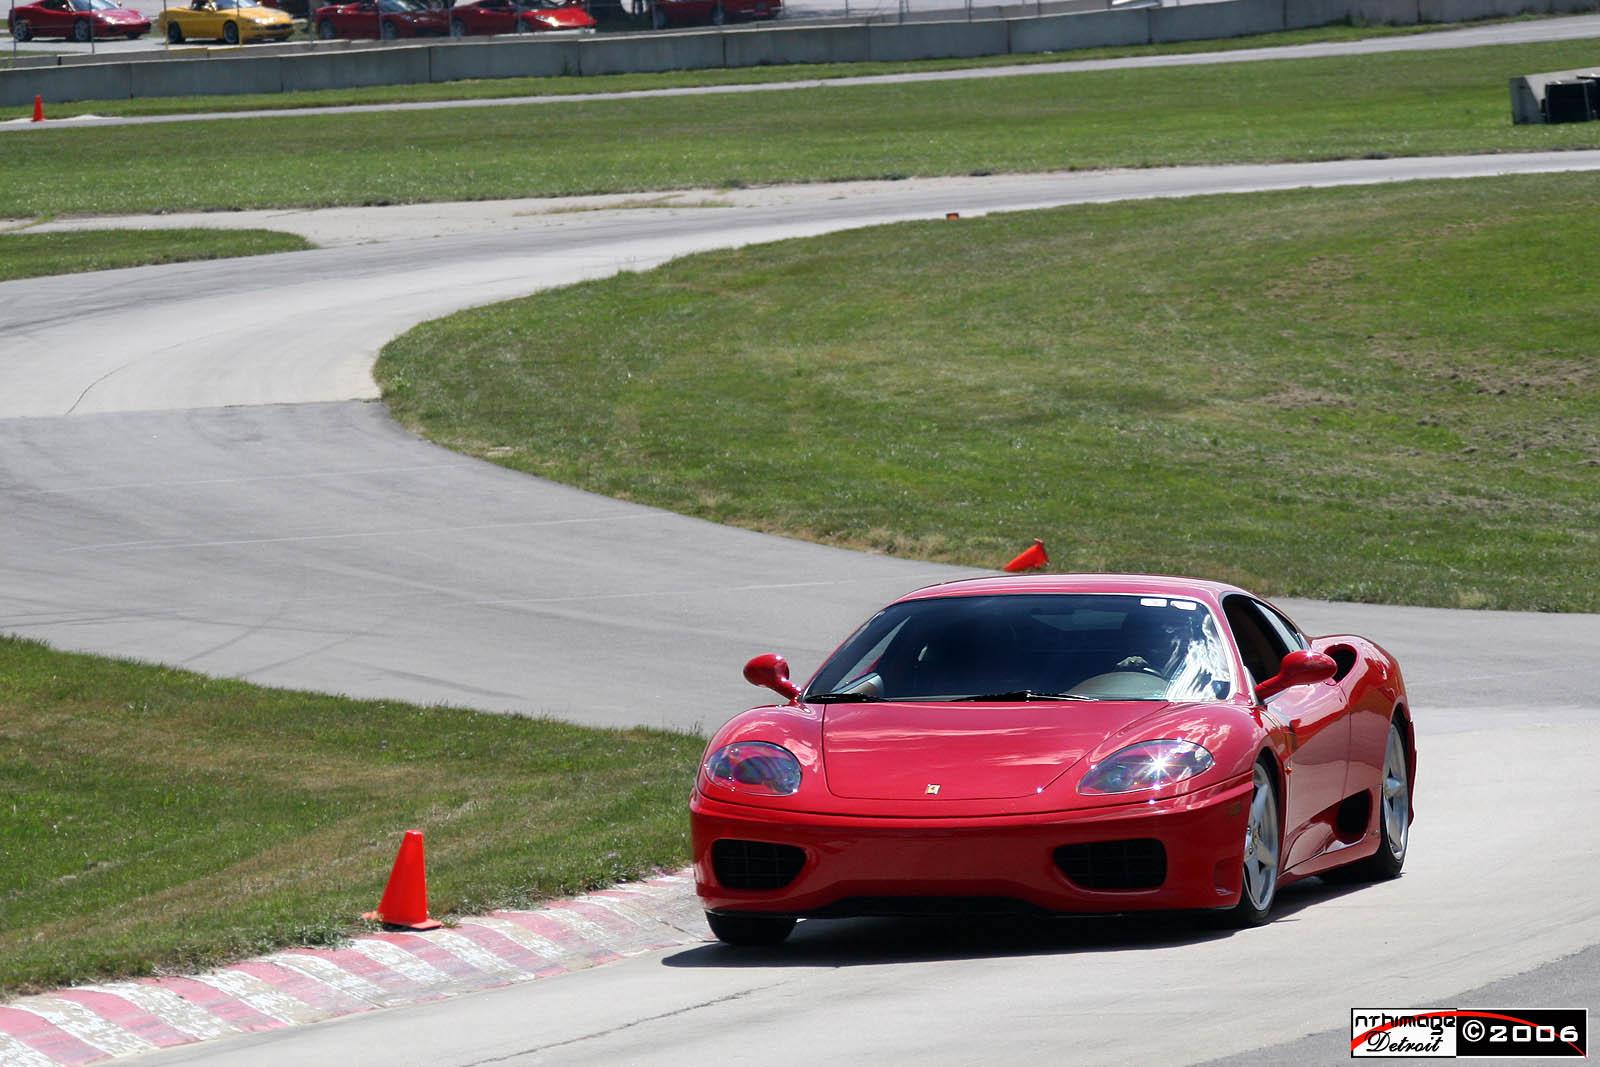 Nthimage Cauley Ferrari Track Day Waterford Hills